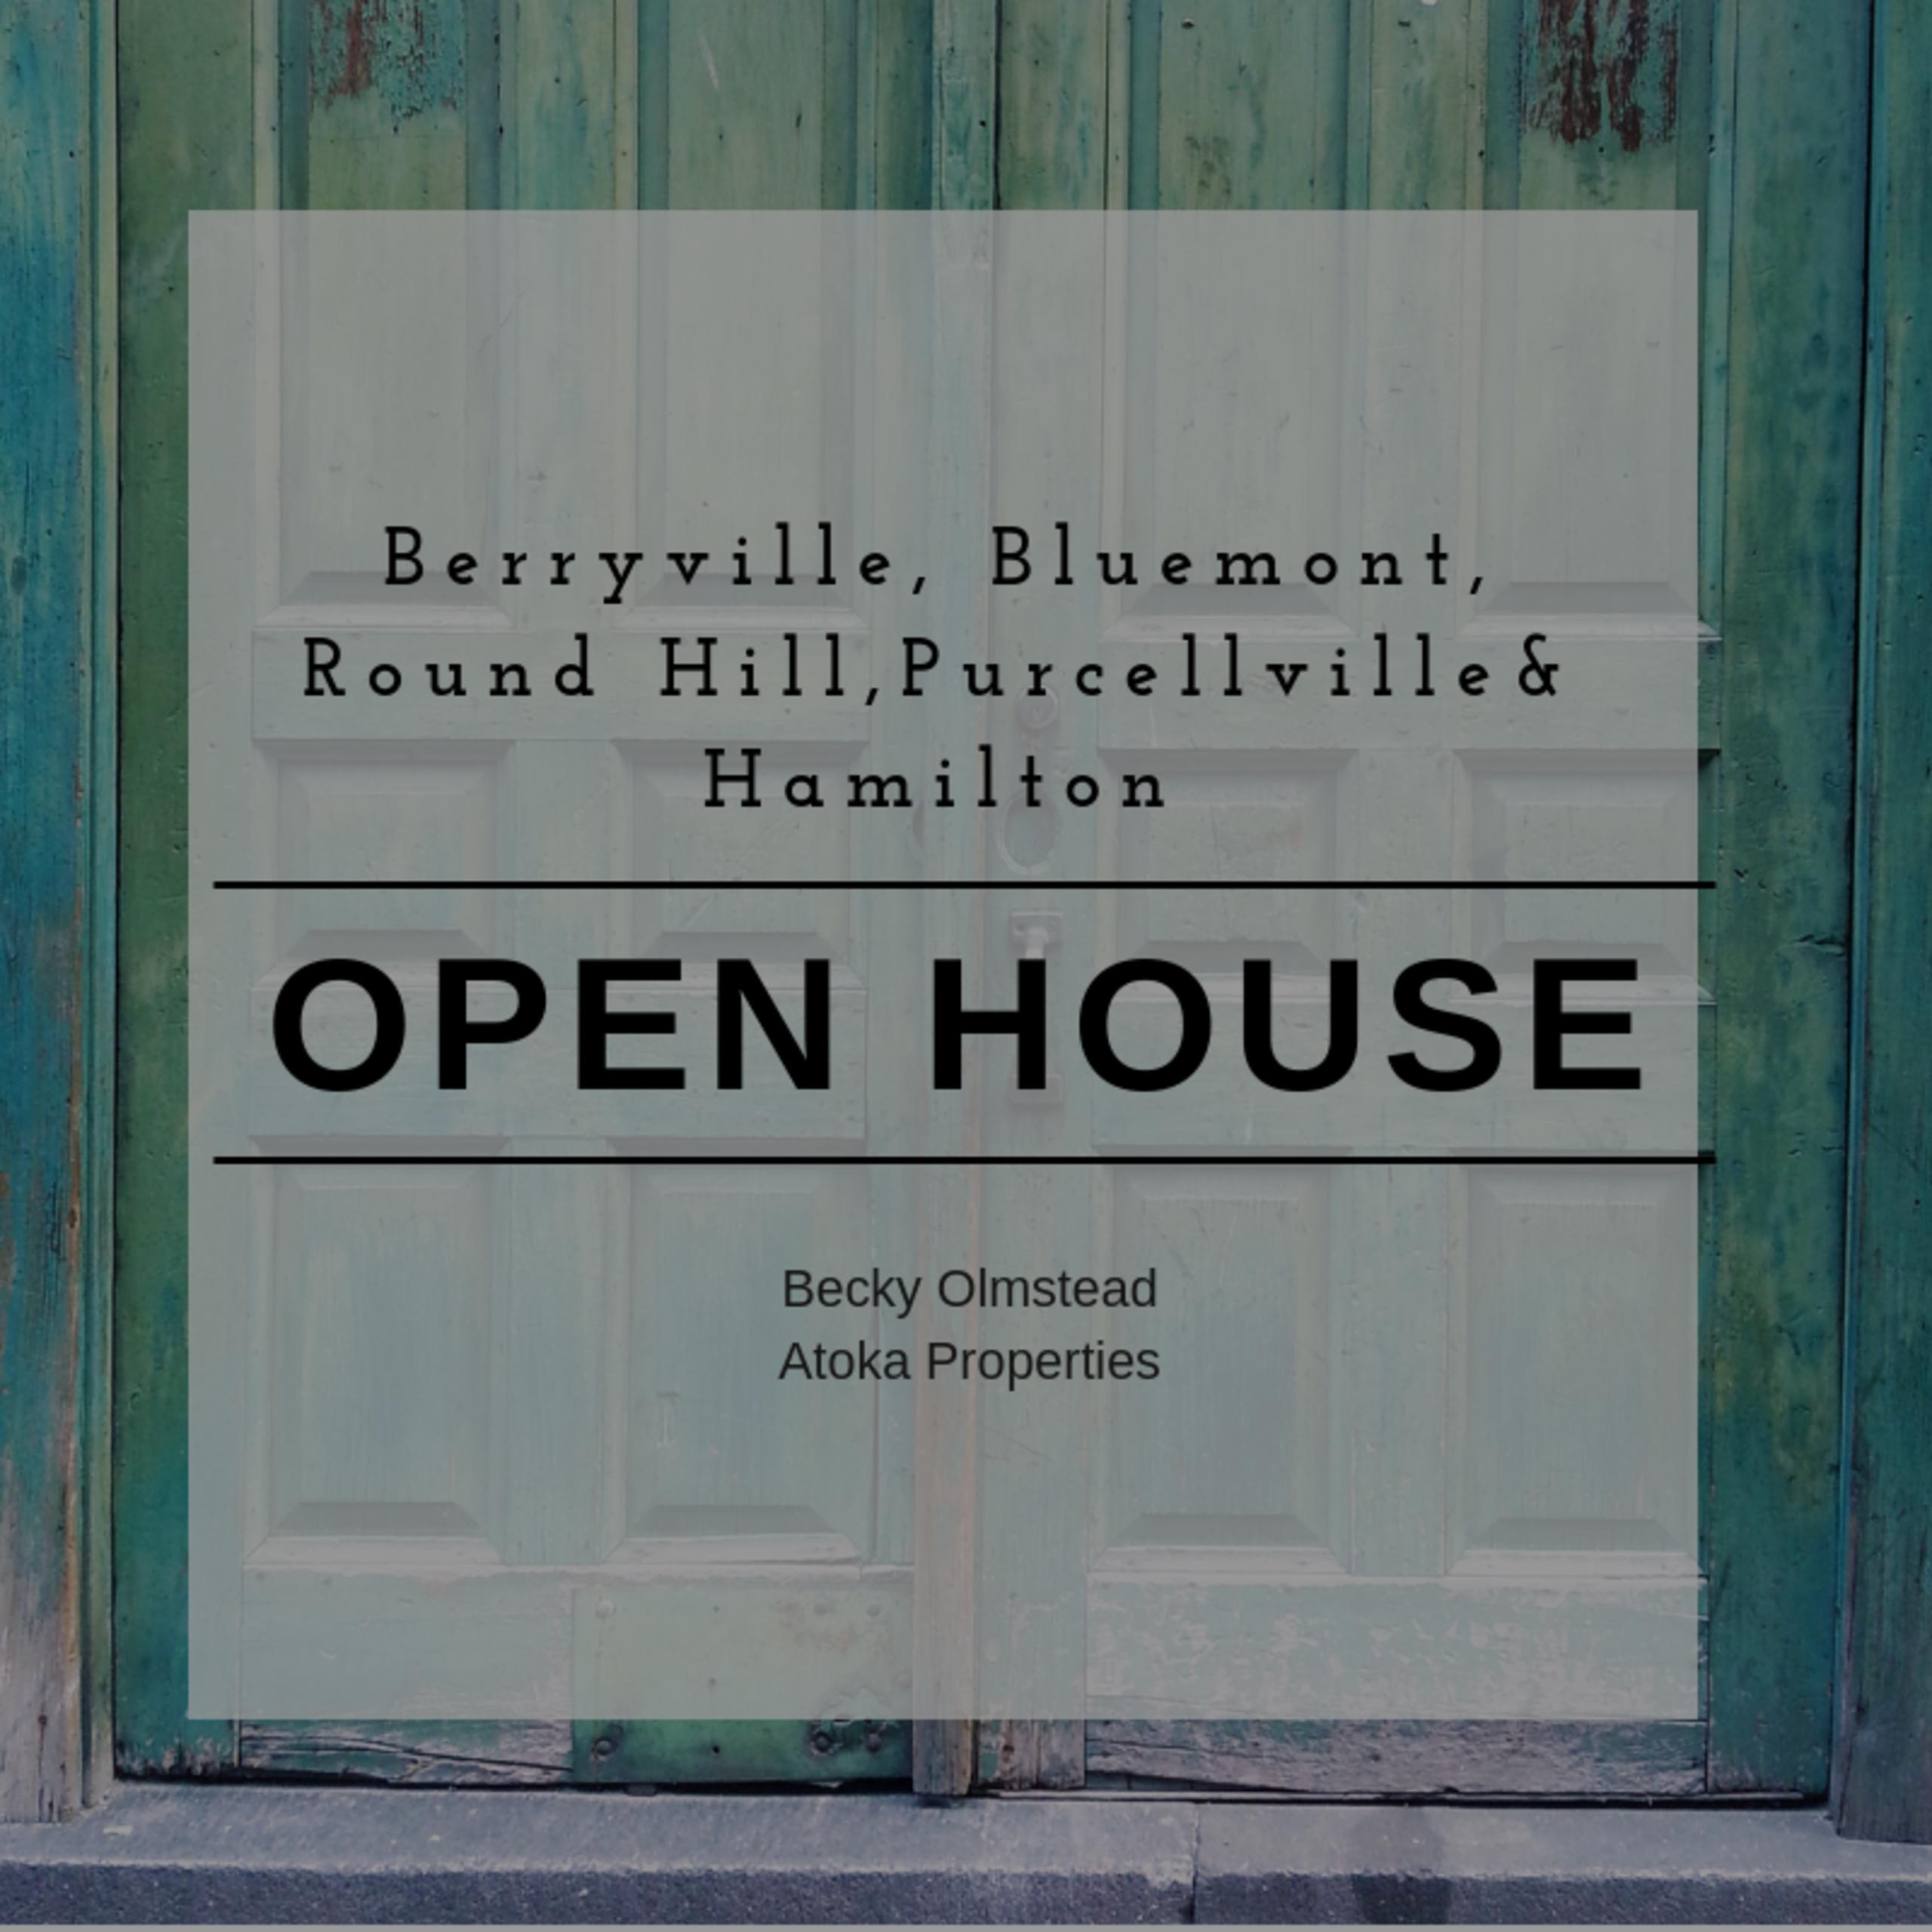 OPEN HOUSE LIST 10/6/18 – 10/7/18